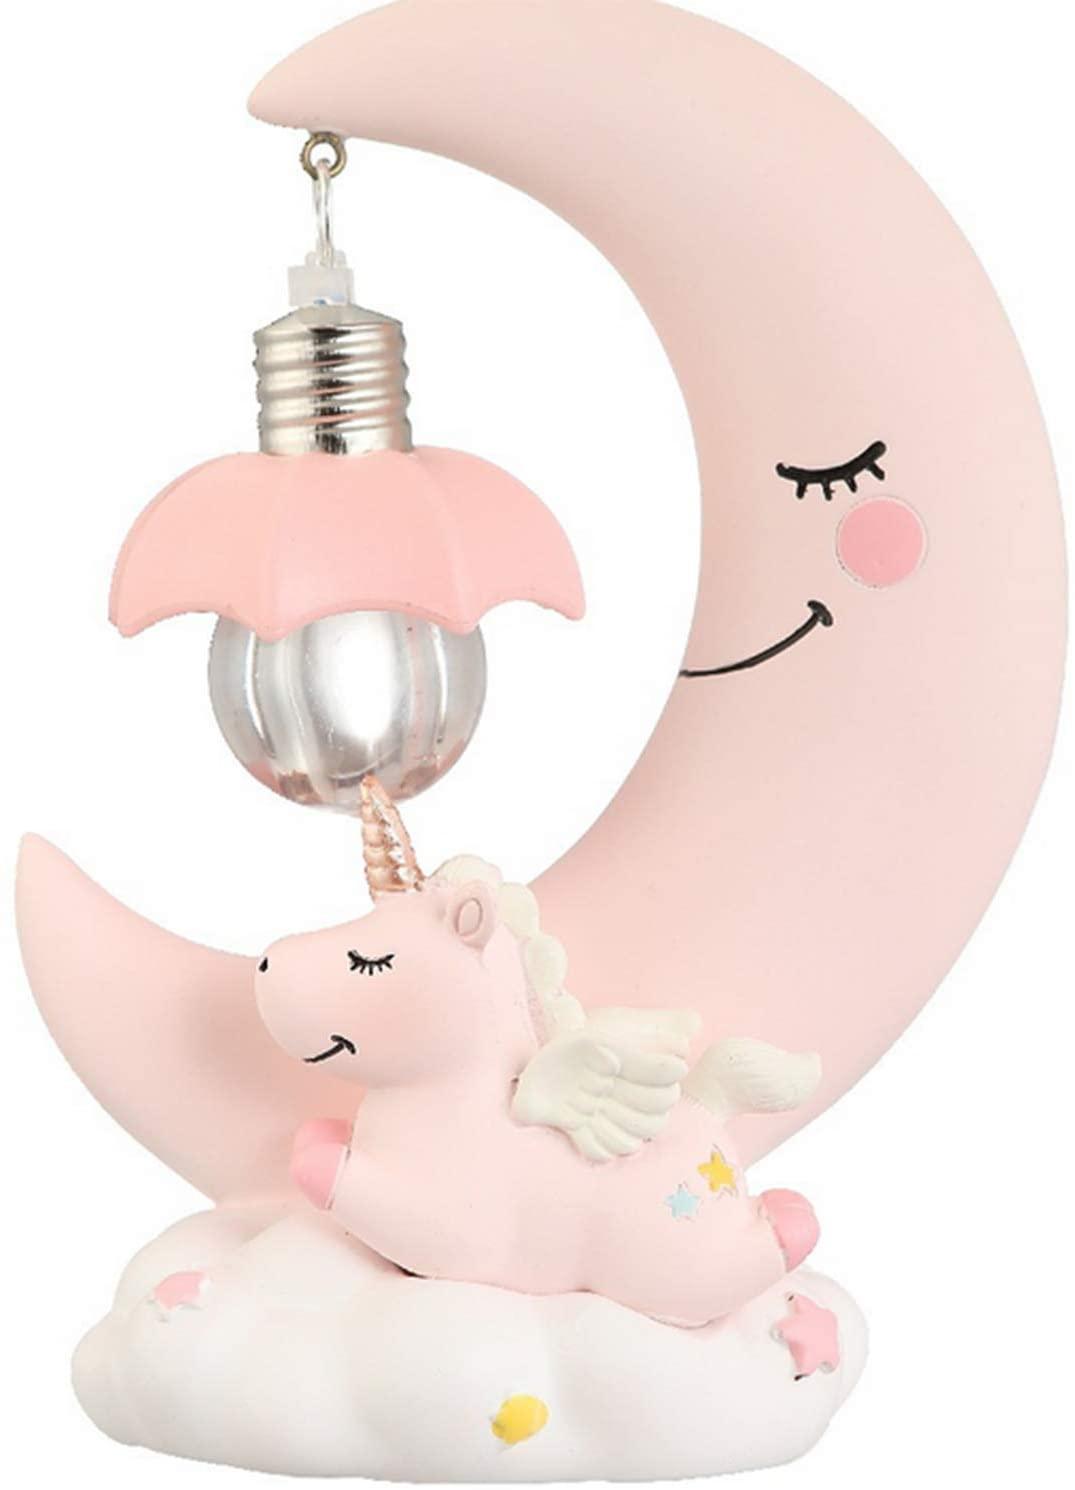 Unicorn Moon Night Light,Fantasee Led Night Light,Romantic Bedroom Decor Night Lamp Baby Kids Toy Birthday Xmas Gift (Pink)